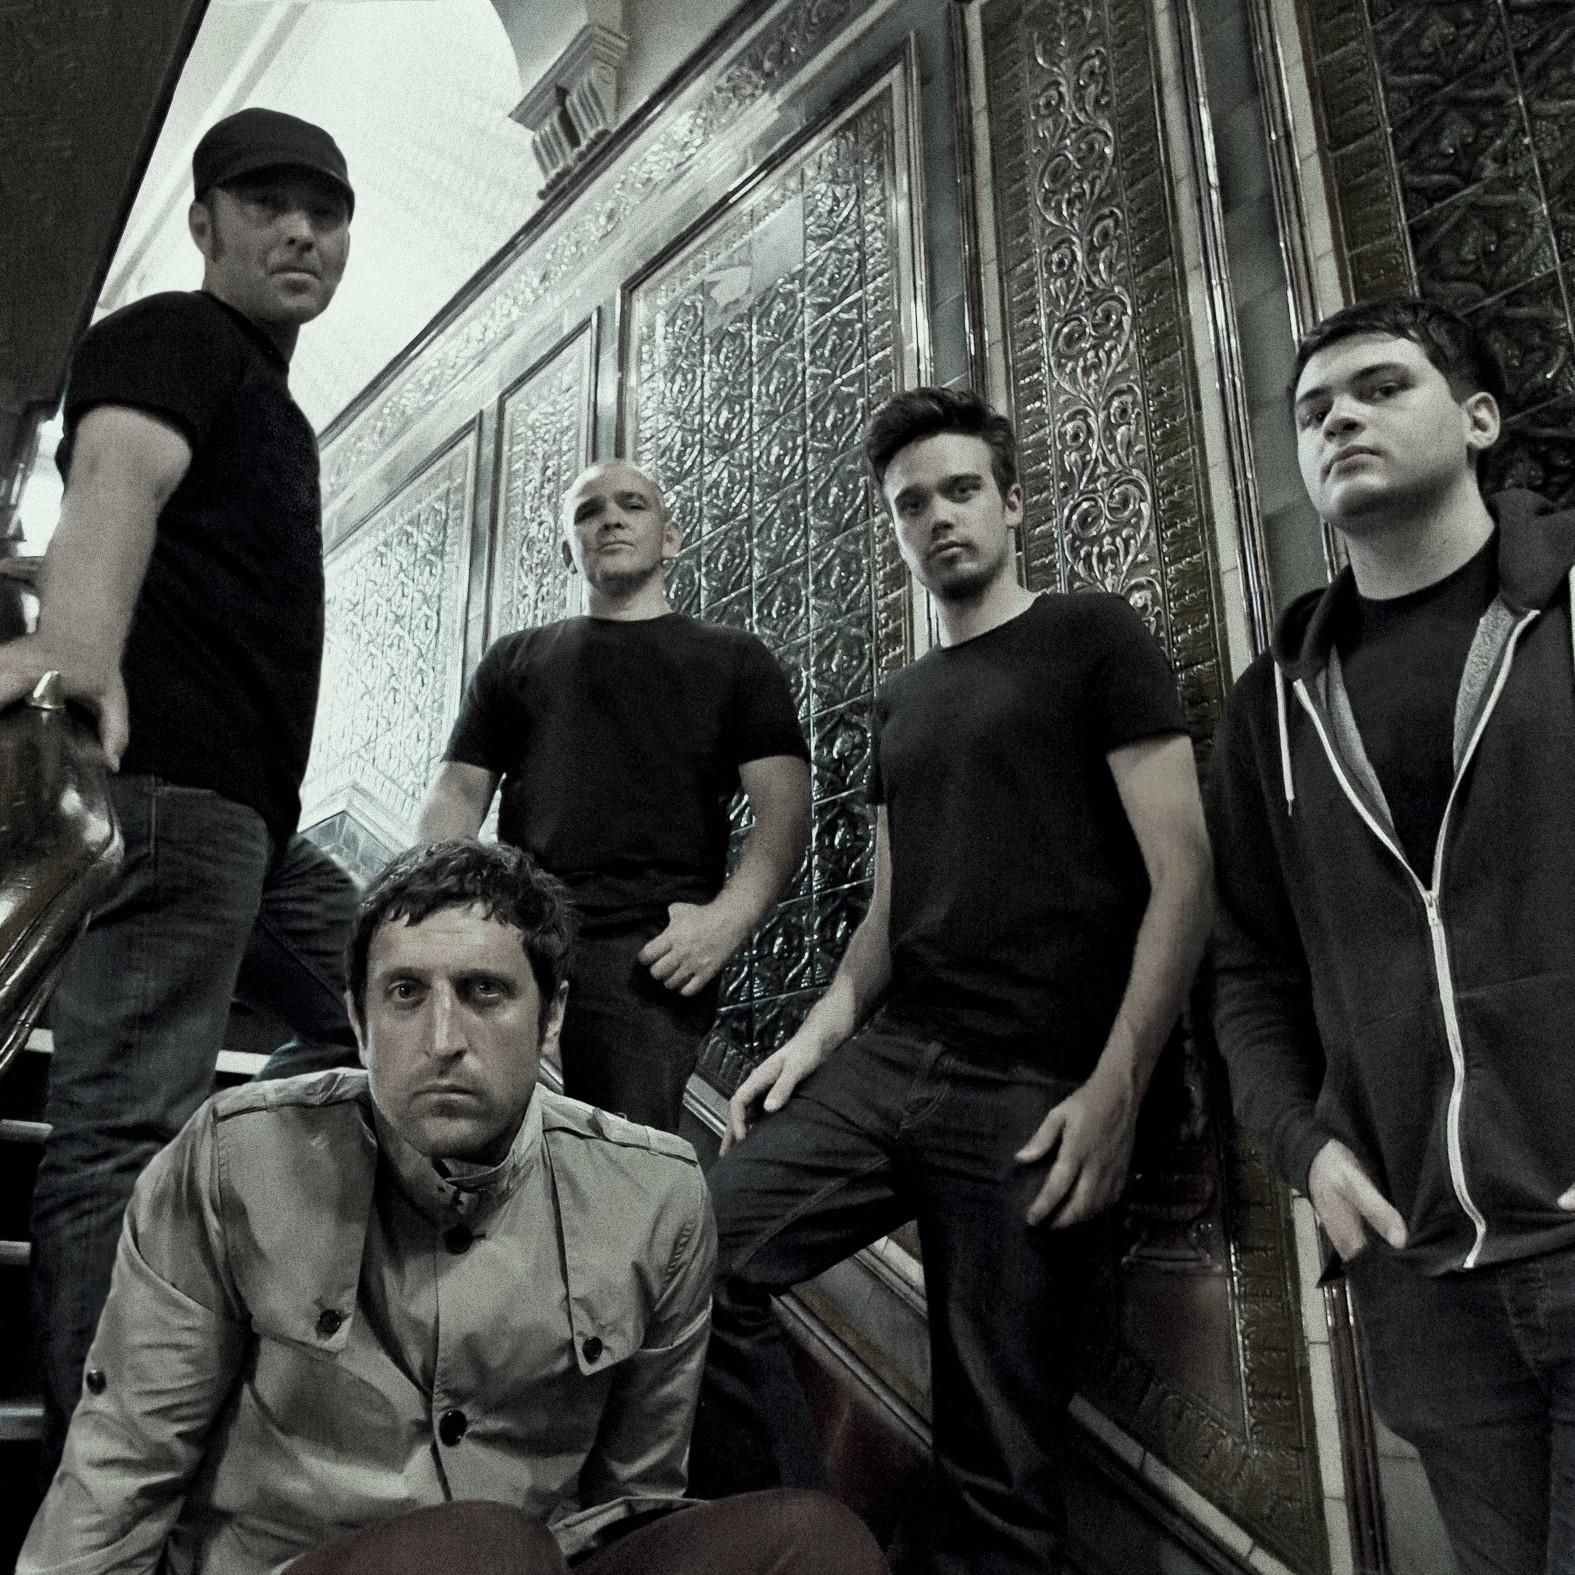 Bradford band Warme